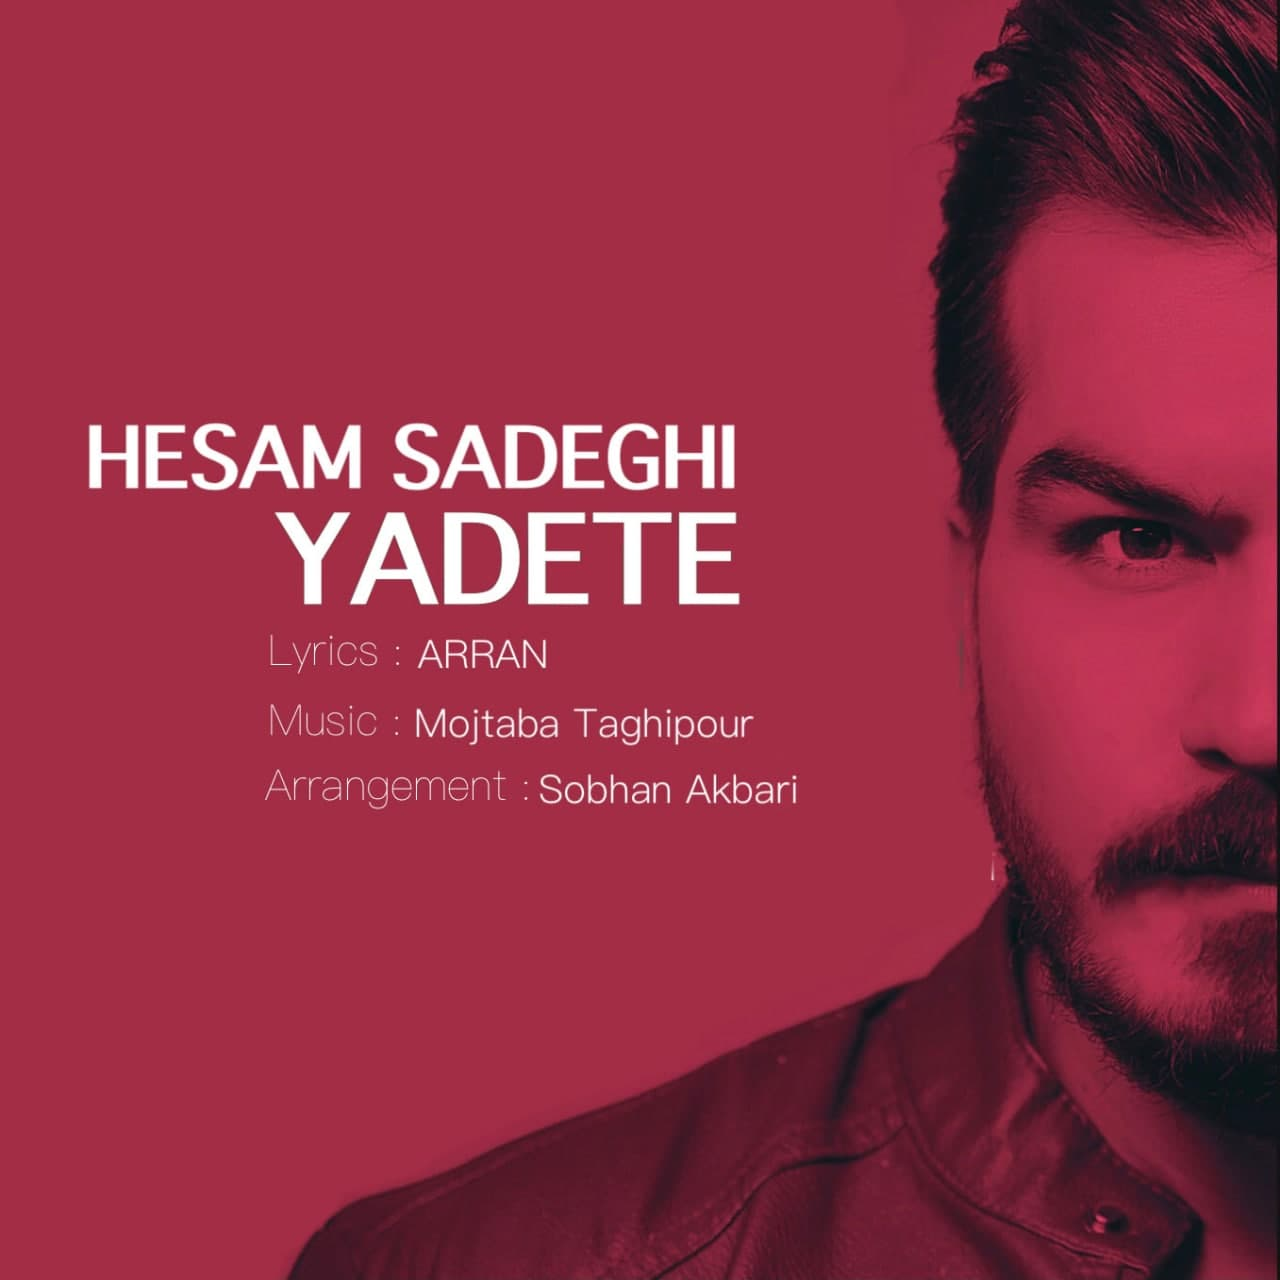 دانلود آهنگ جدید حسام صادقی بنام یادته